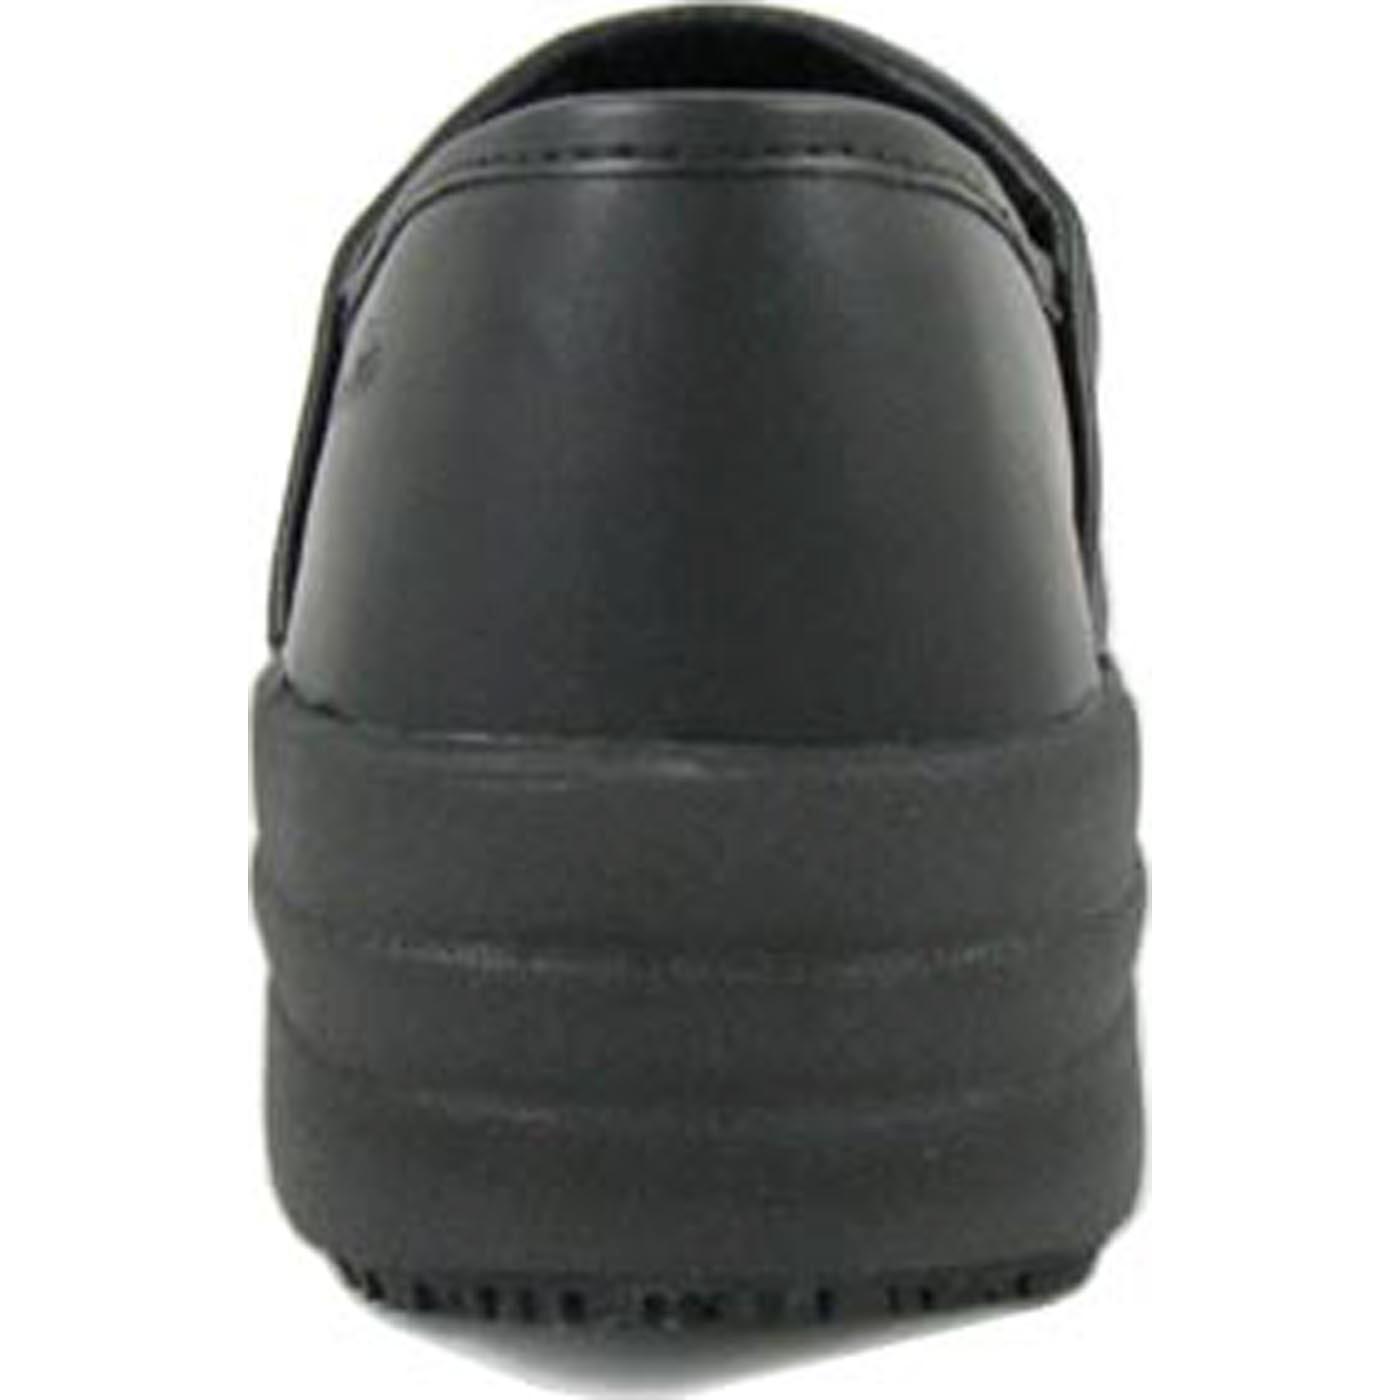 kore resistant comforter with comfortable oxford toe view st moc black bush bourbon fullscreen street lyst slip nunn technology shoes walking comfort